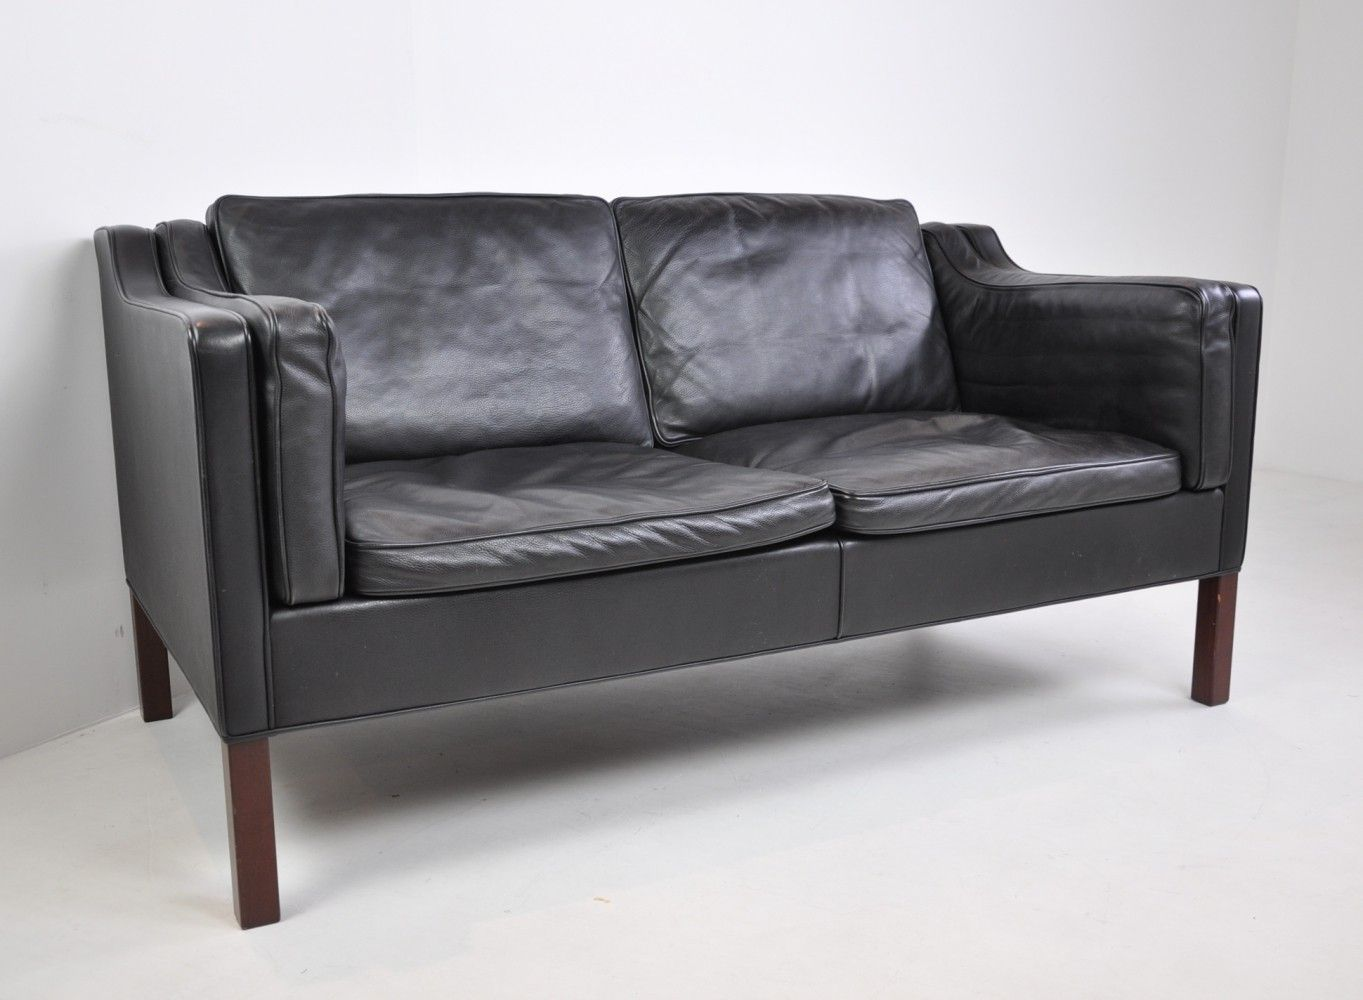 Swell For Sale Two Seater Sofa By Borge Mogensen For Fredericia Creativecarmelina Interior Chair Design Creativecarmelinacom